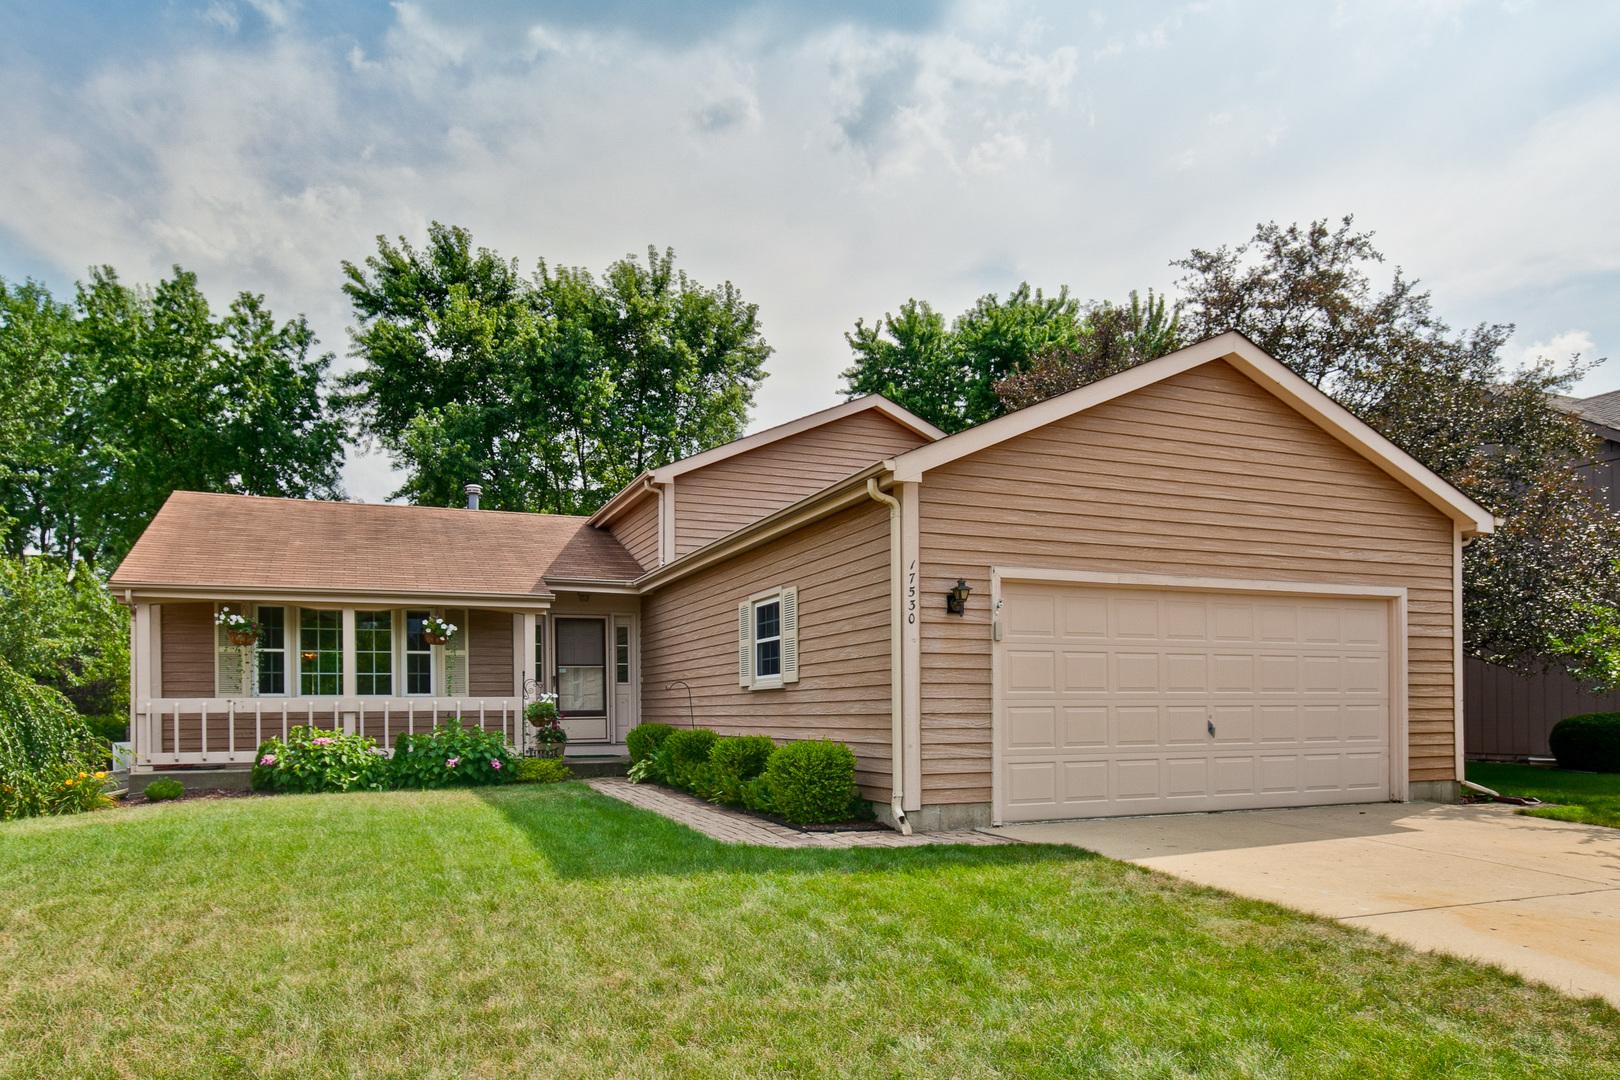 17530 Huntington Circle, Grayslake, Illinois 60030